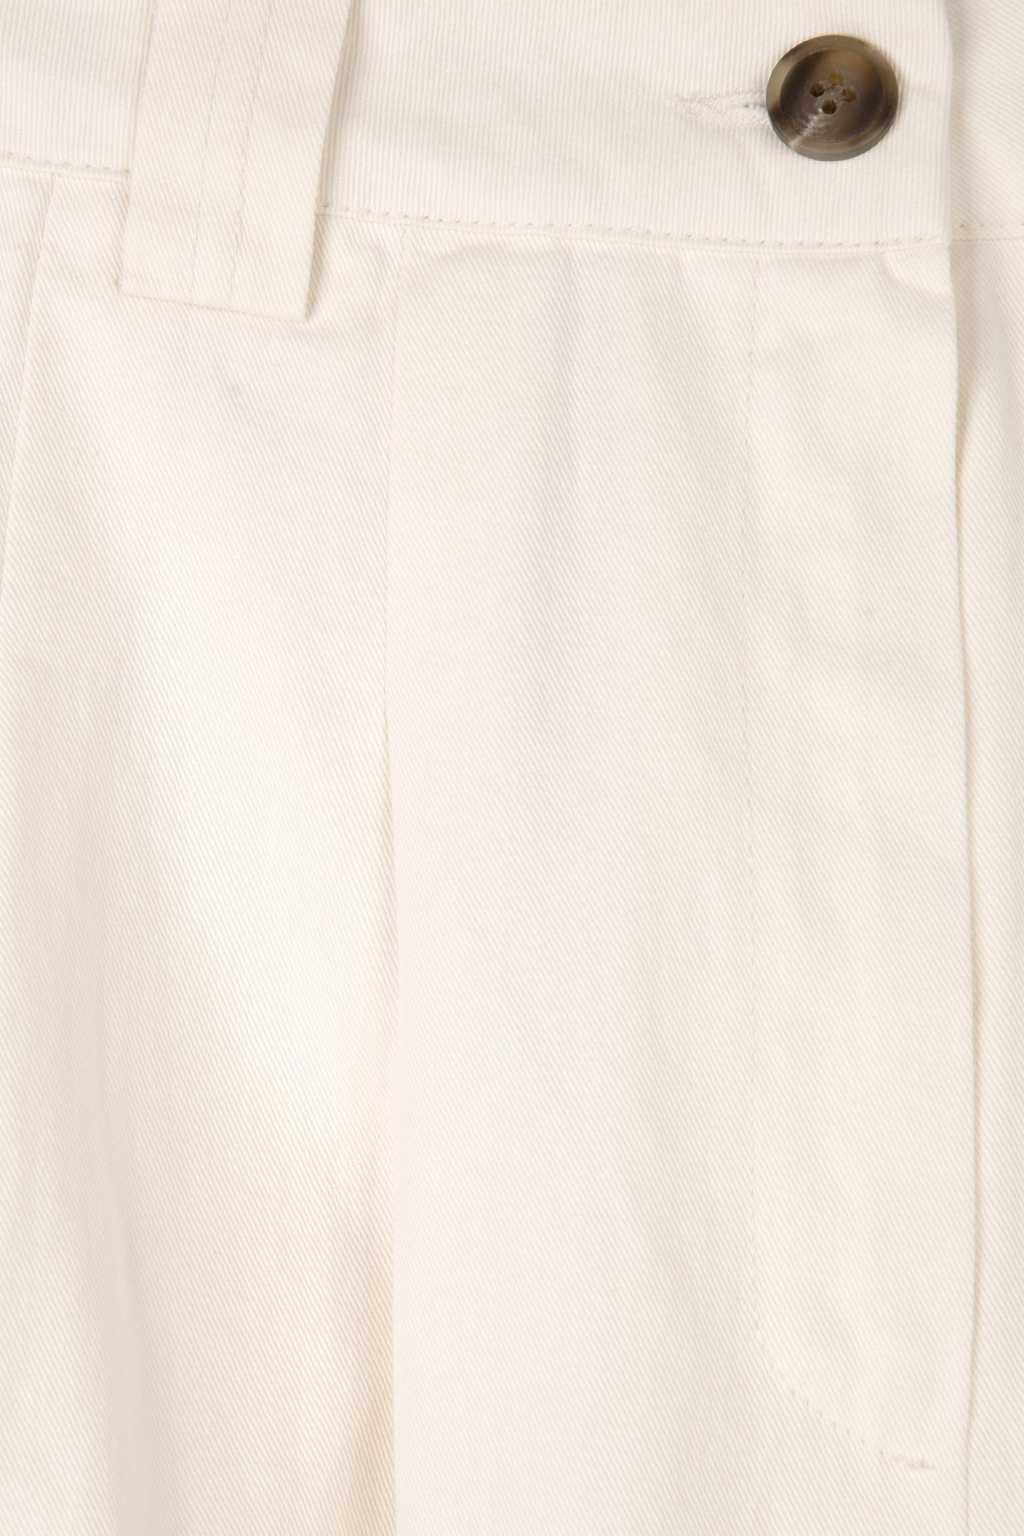 Pant K013 Cream 8